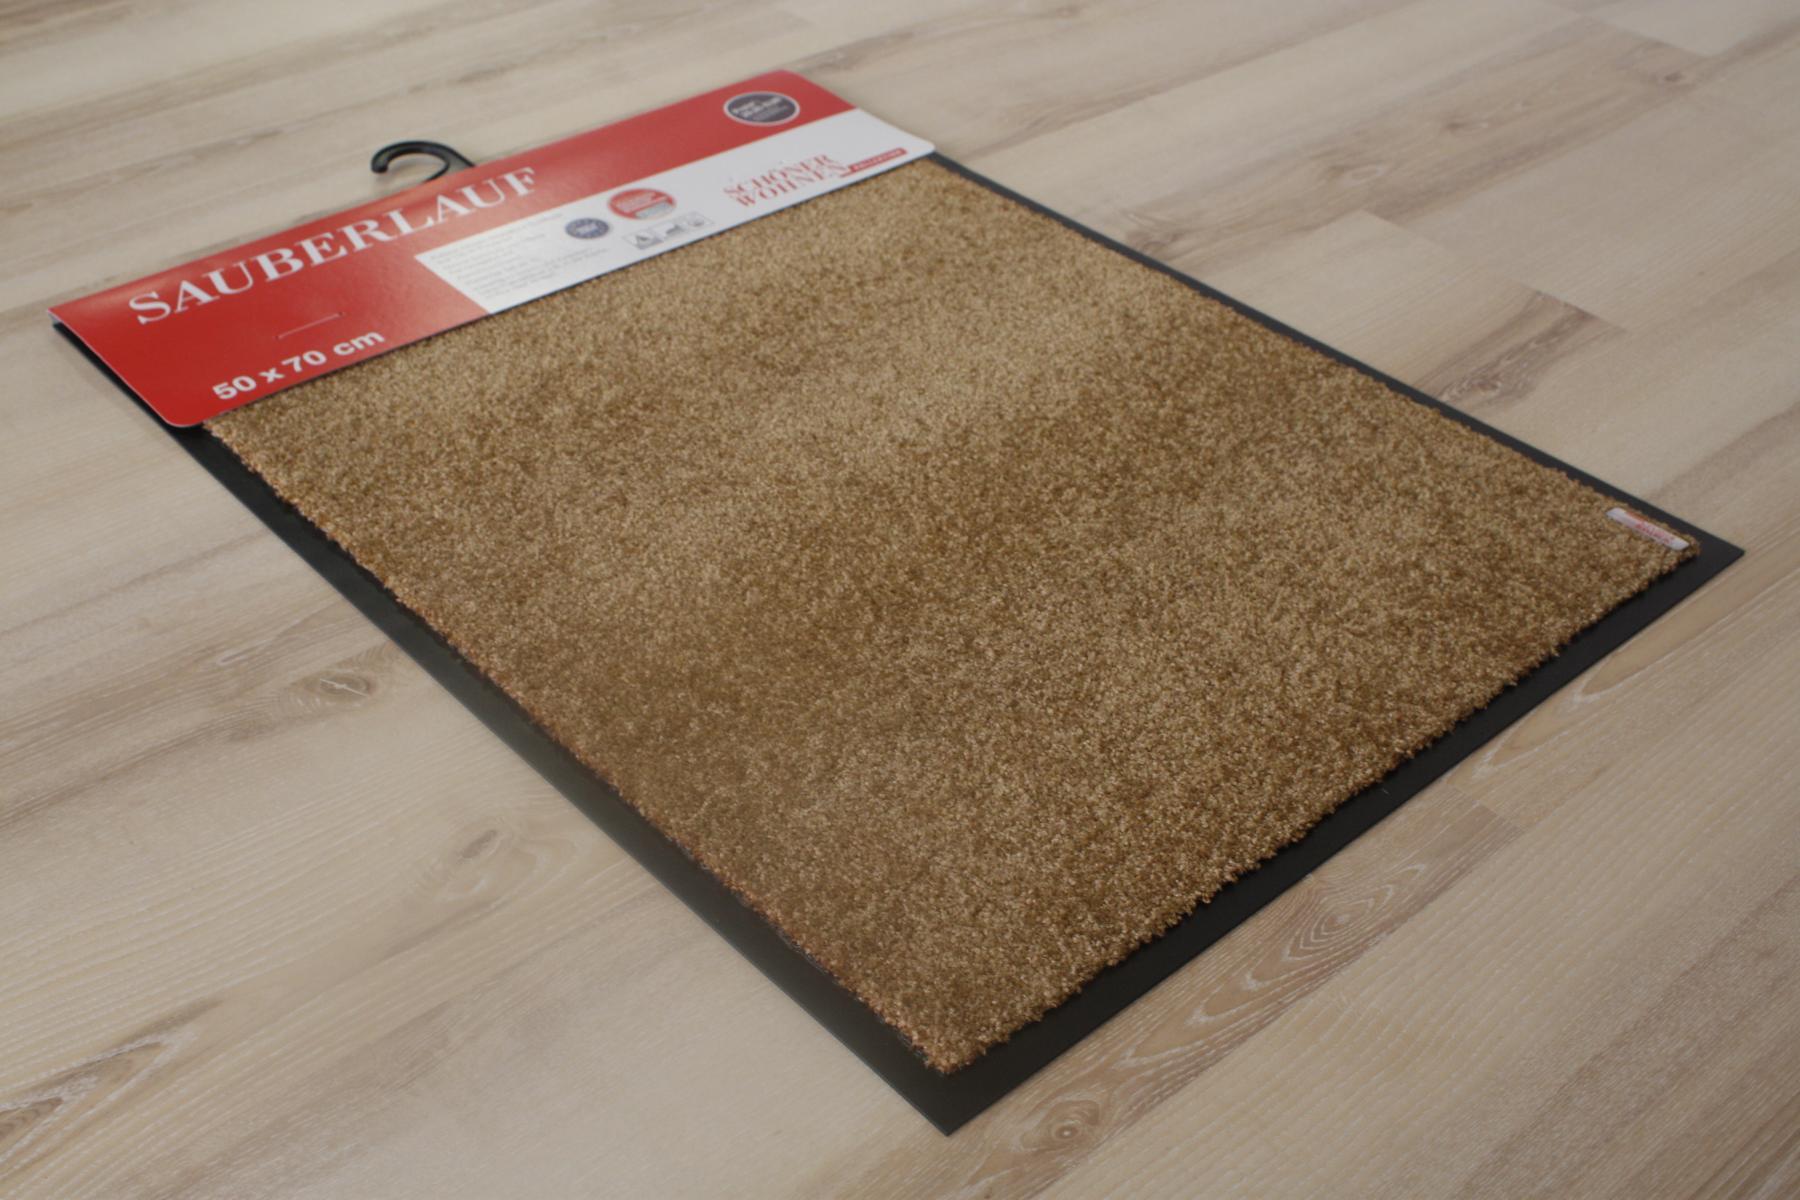 doormat sch ner wohnen 001 uni 008 gold 50x70 cm doormat. Black Bedroom Furniture Sets. Home Design Ideas